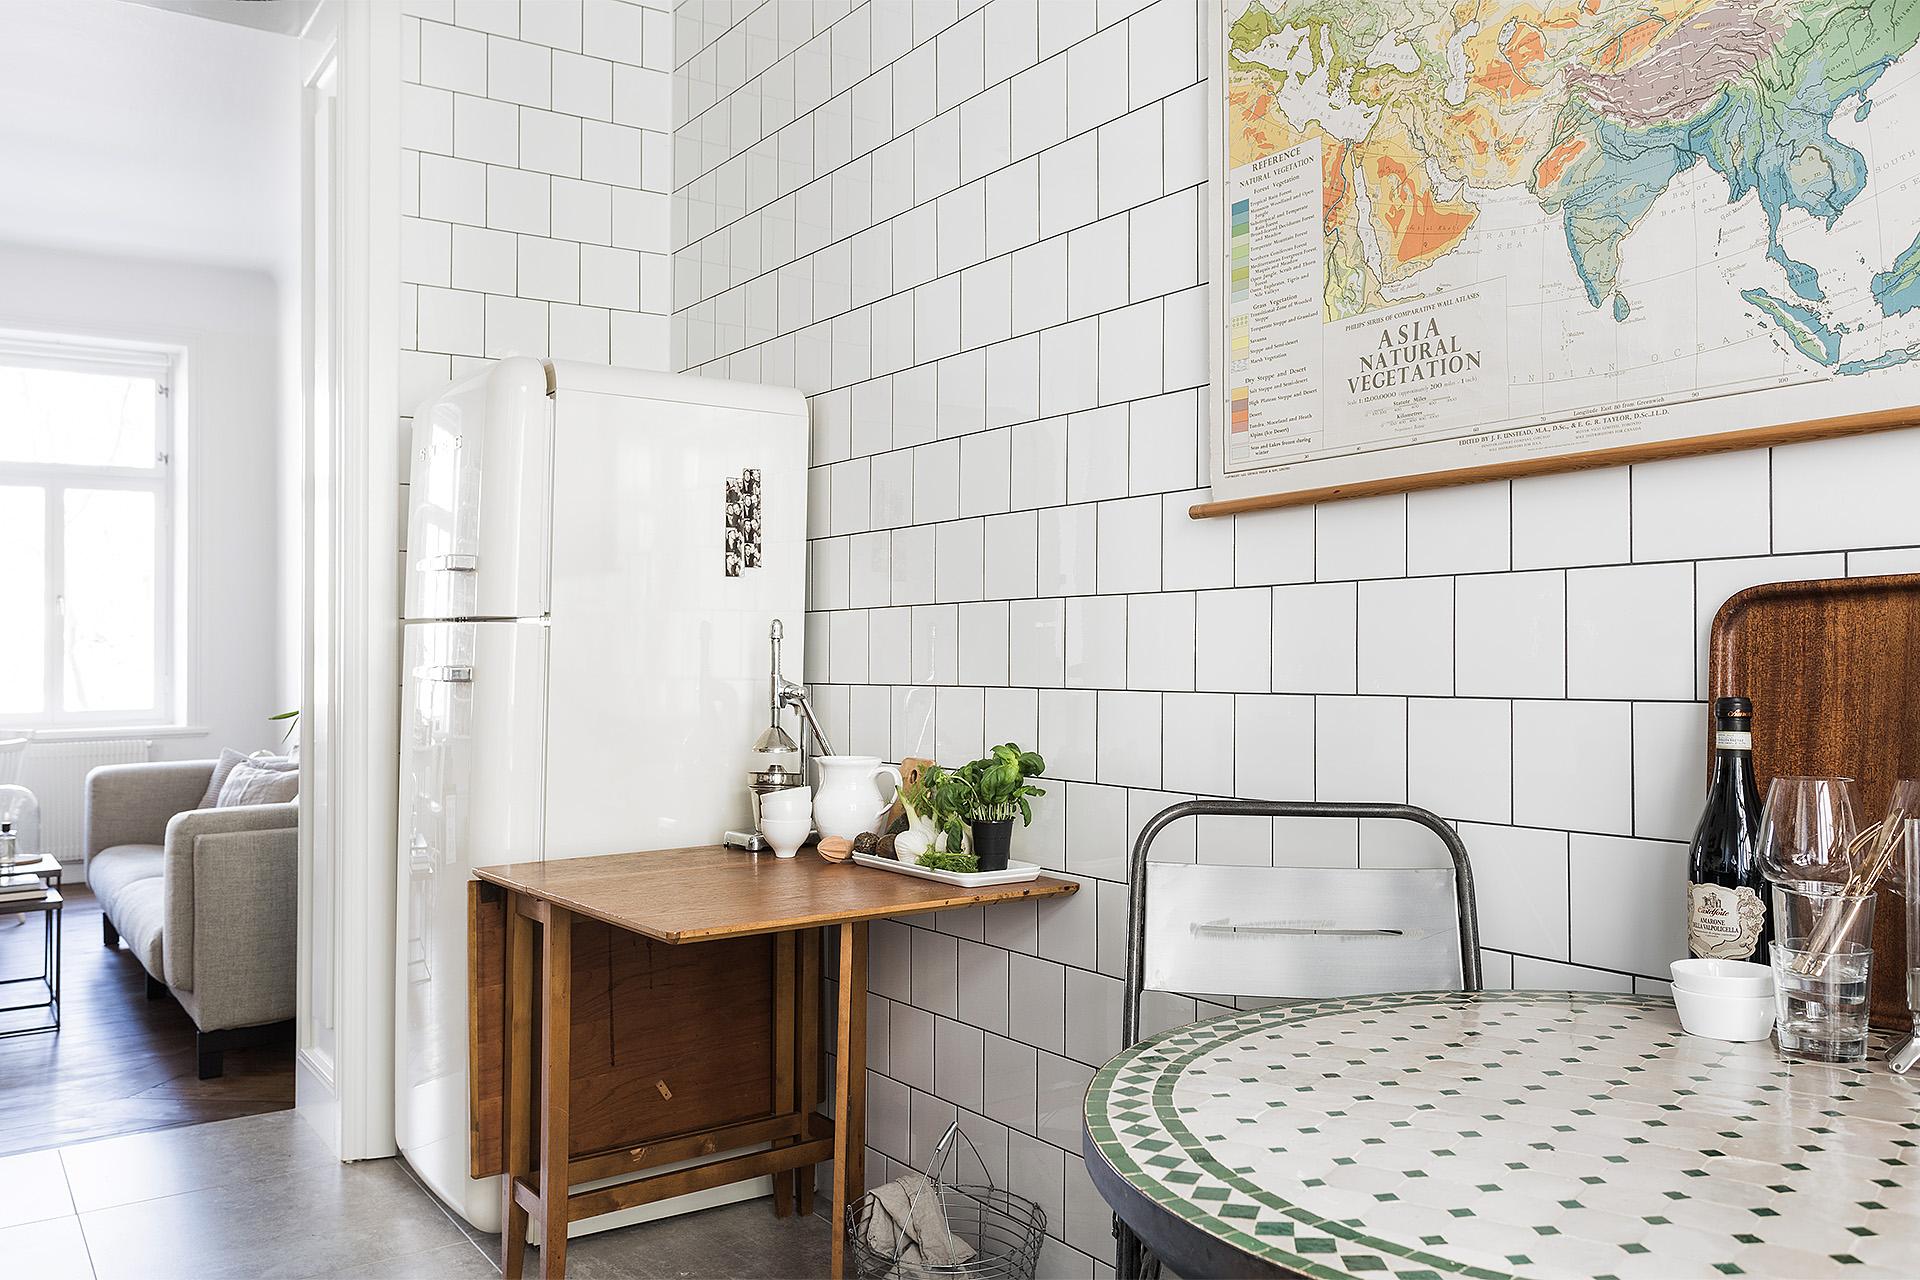 Blauwe Keuken Ikea : Blauwe keuken met witte wandtegels HOMEASE